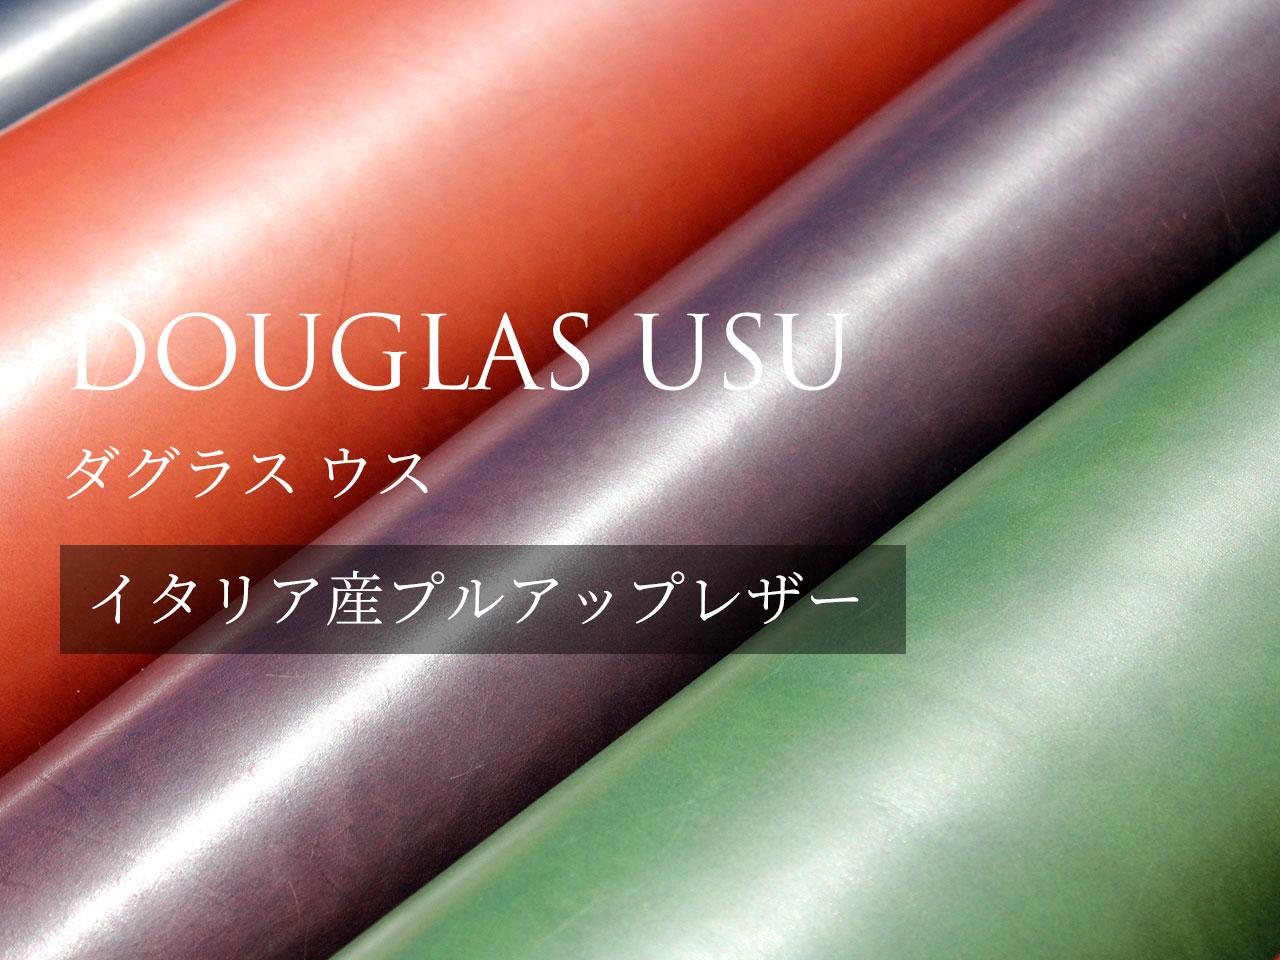 DOUGLAS USU(ダグラスウス)について